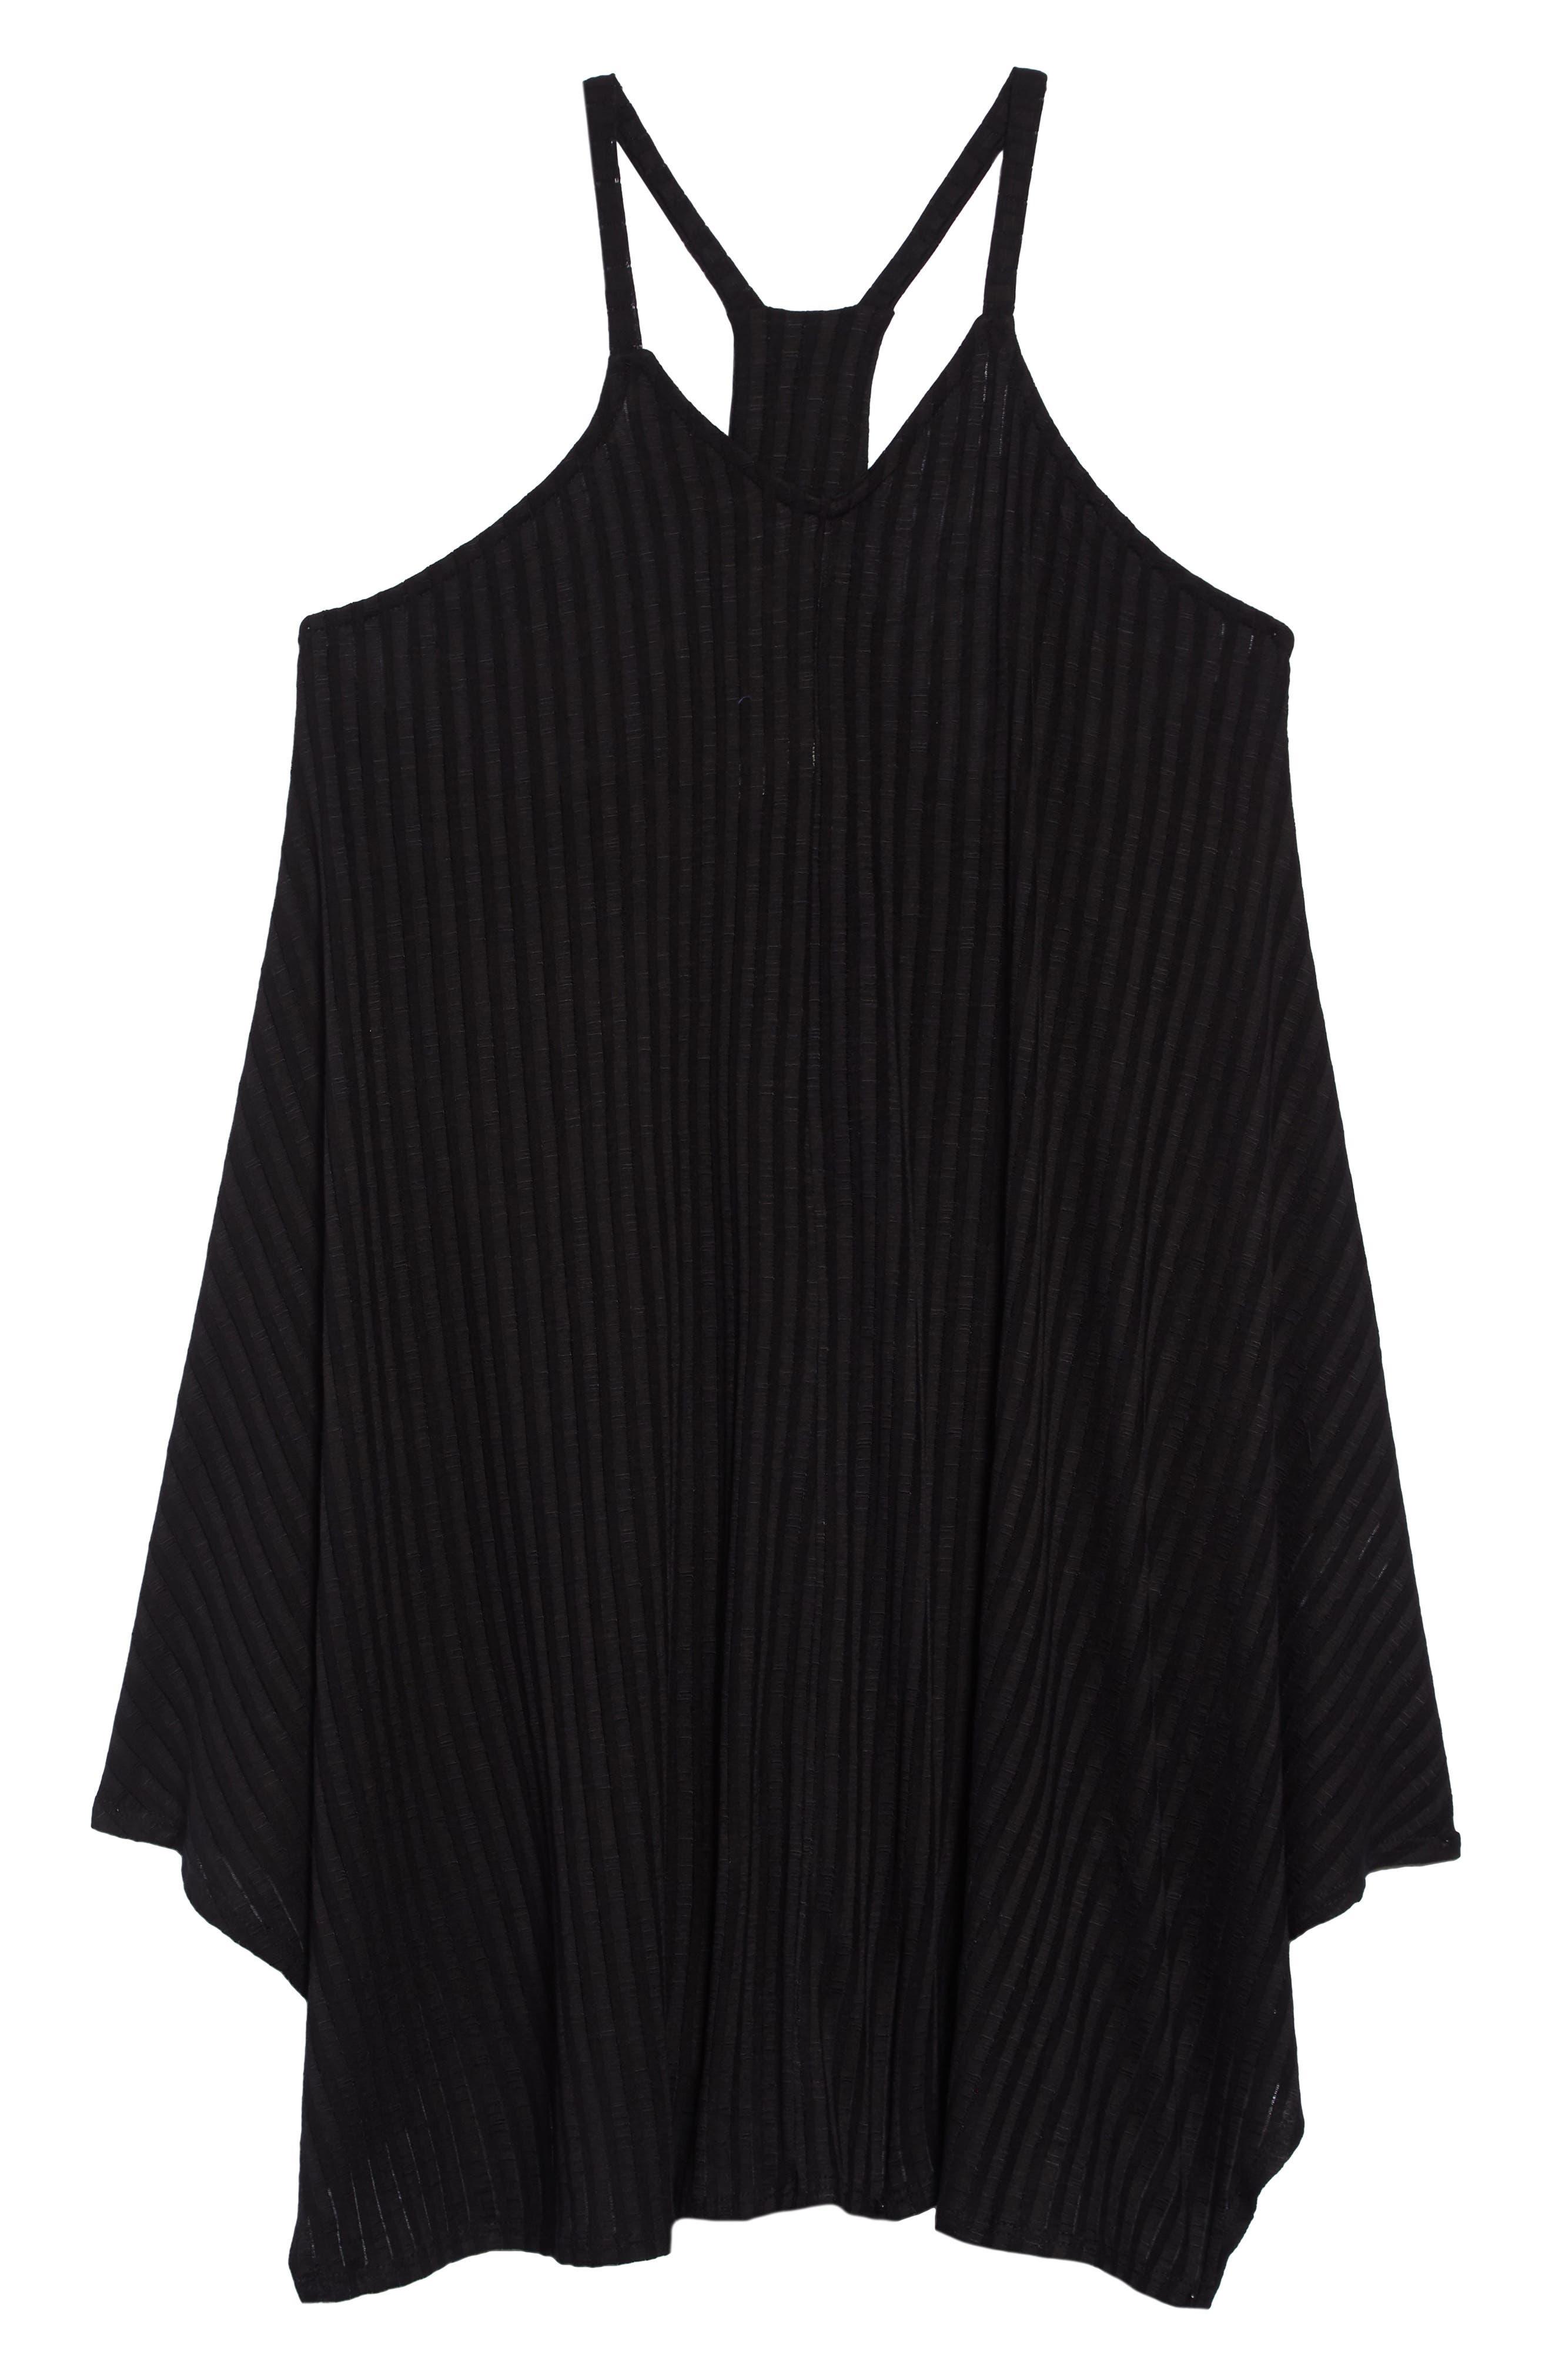 BILLABONG, Twist View Cover-Up Dress, Main thumbnail 1, color, BLACK